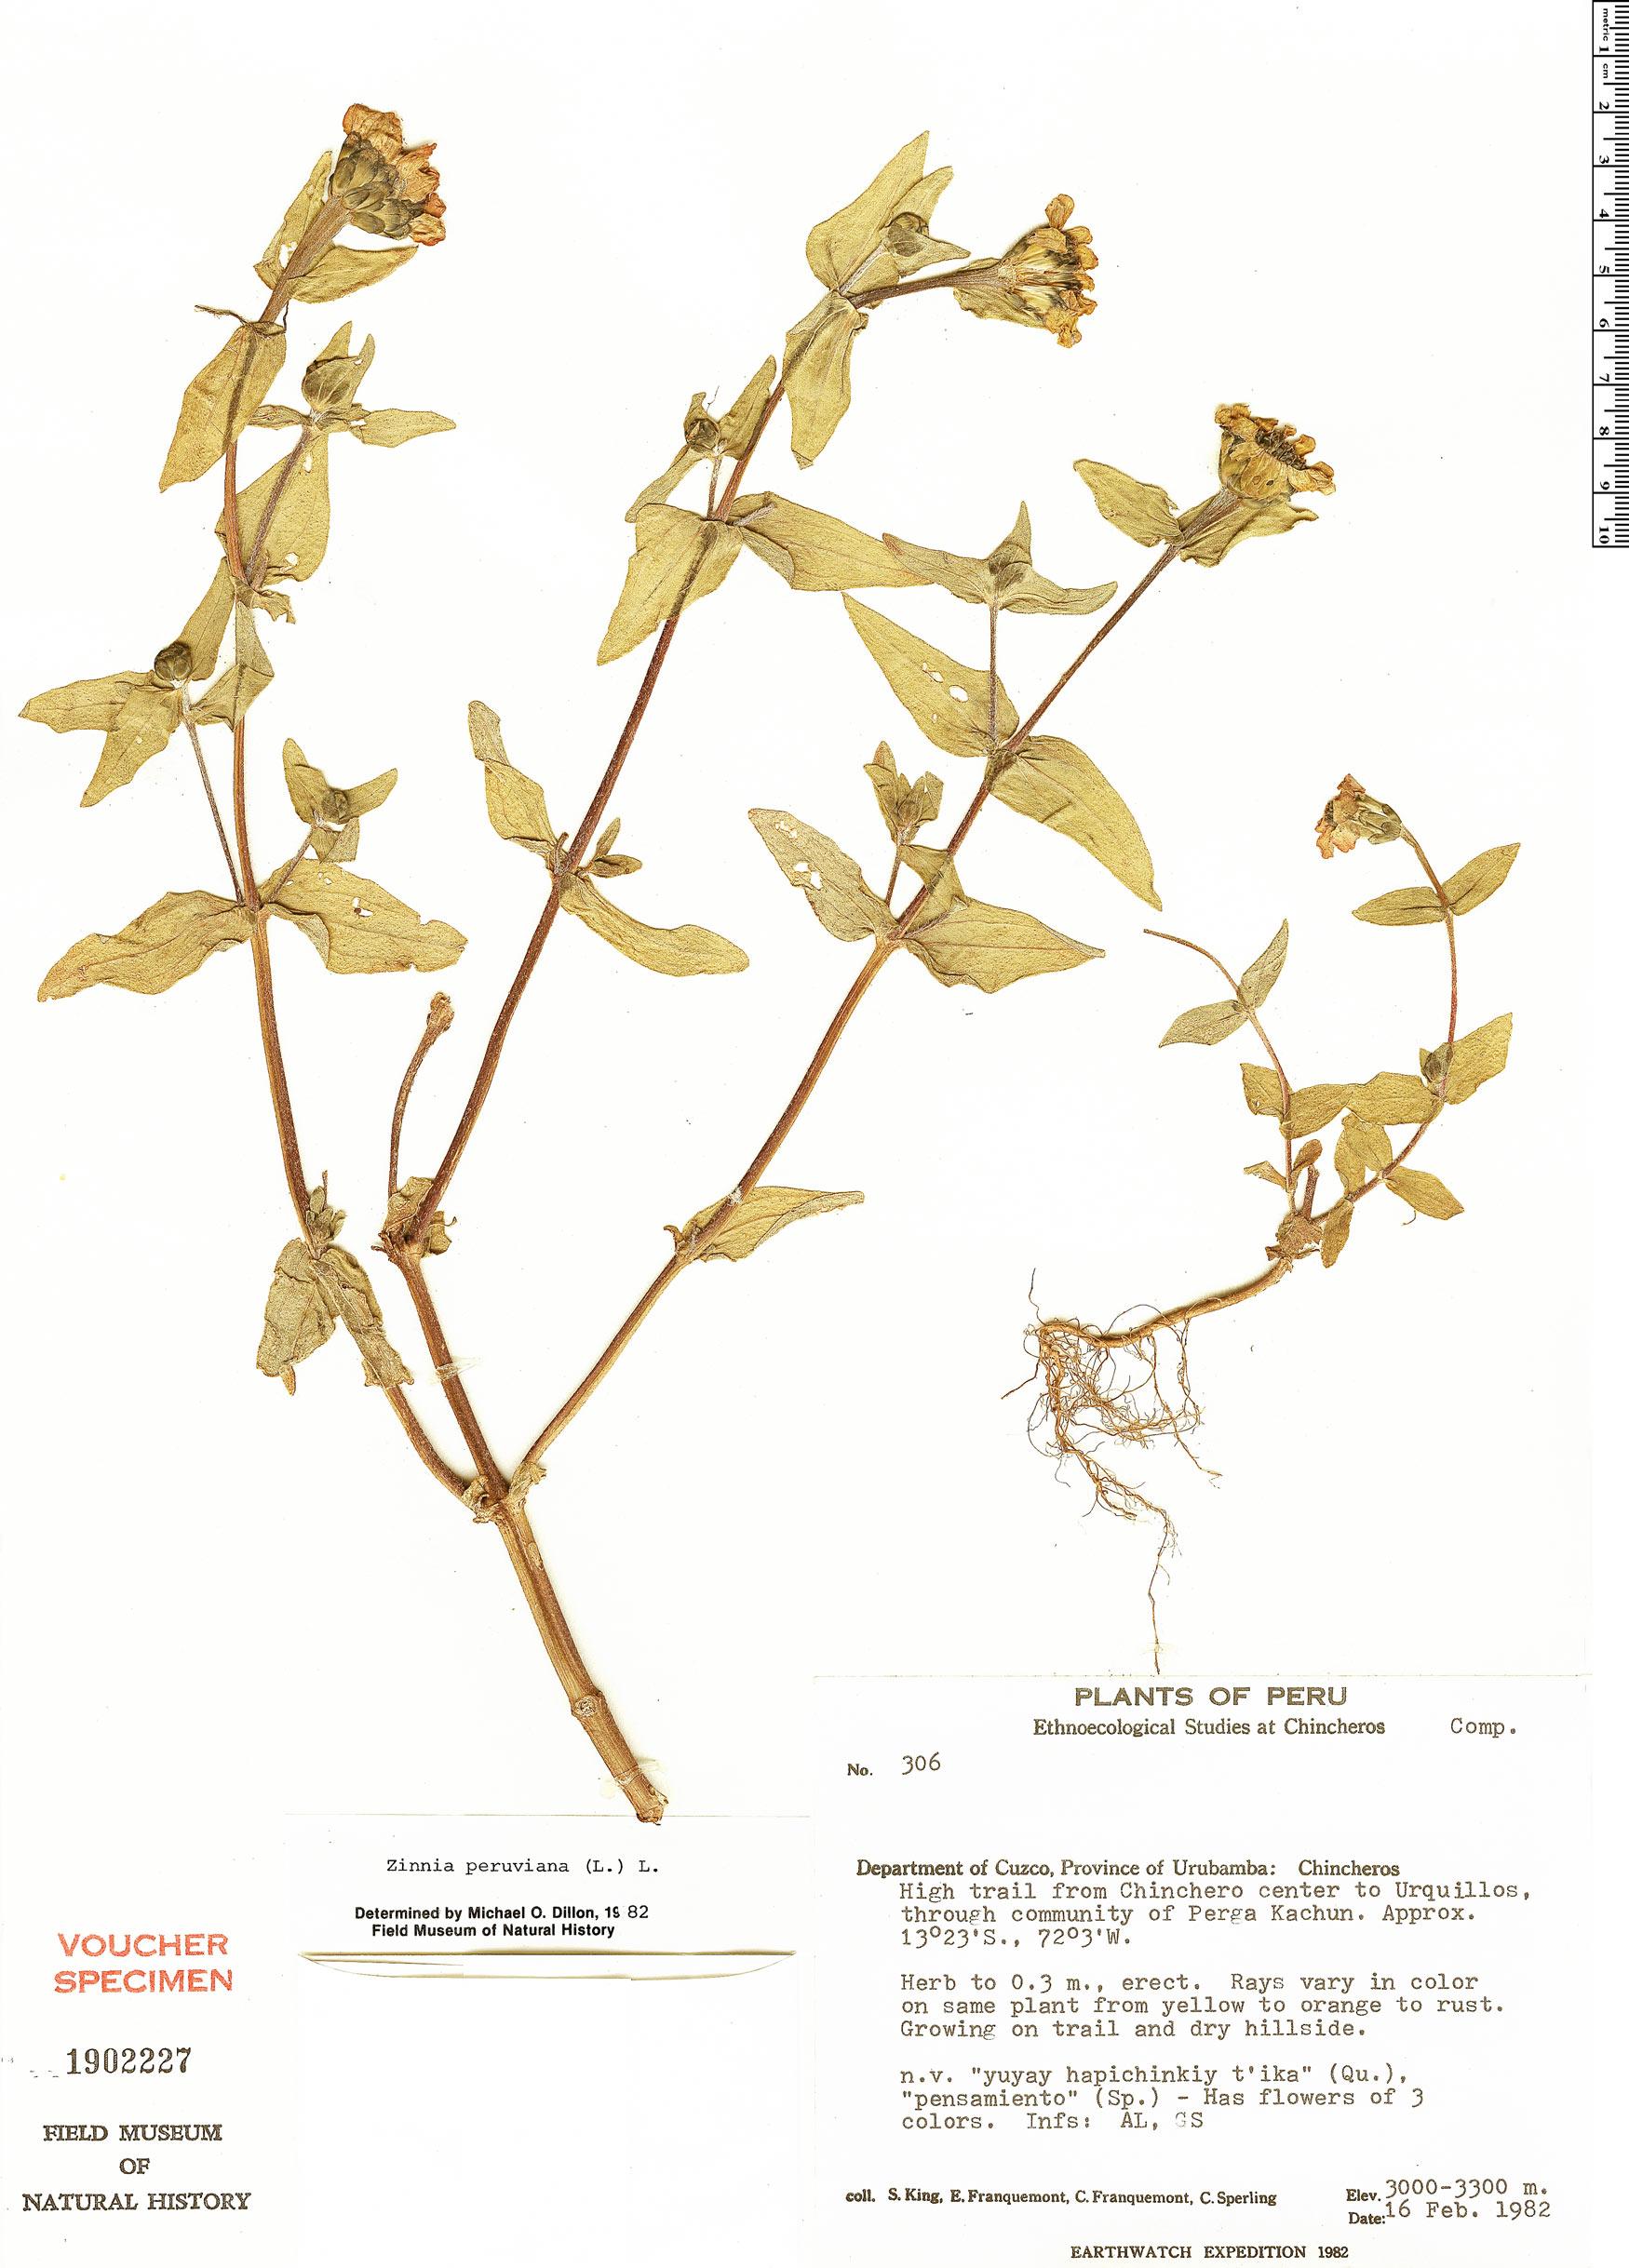 Specimen: Zinnia peruviana